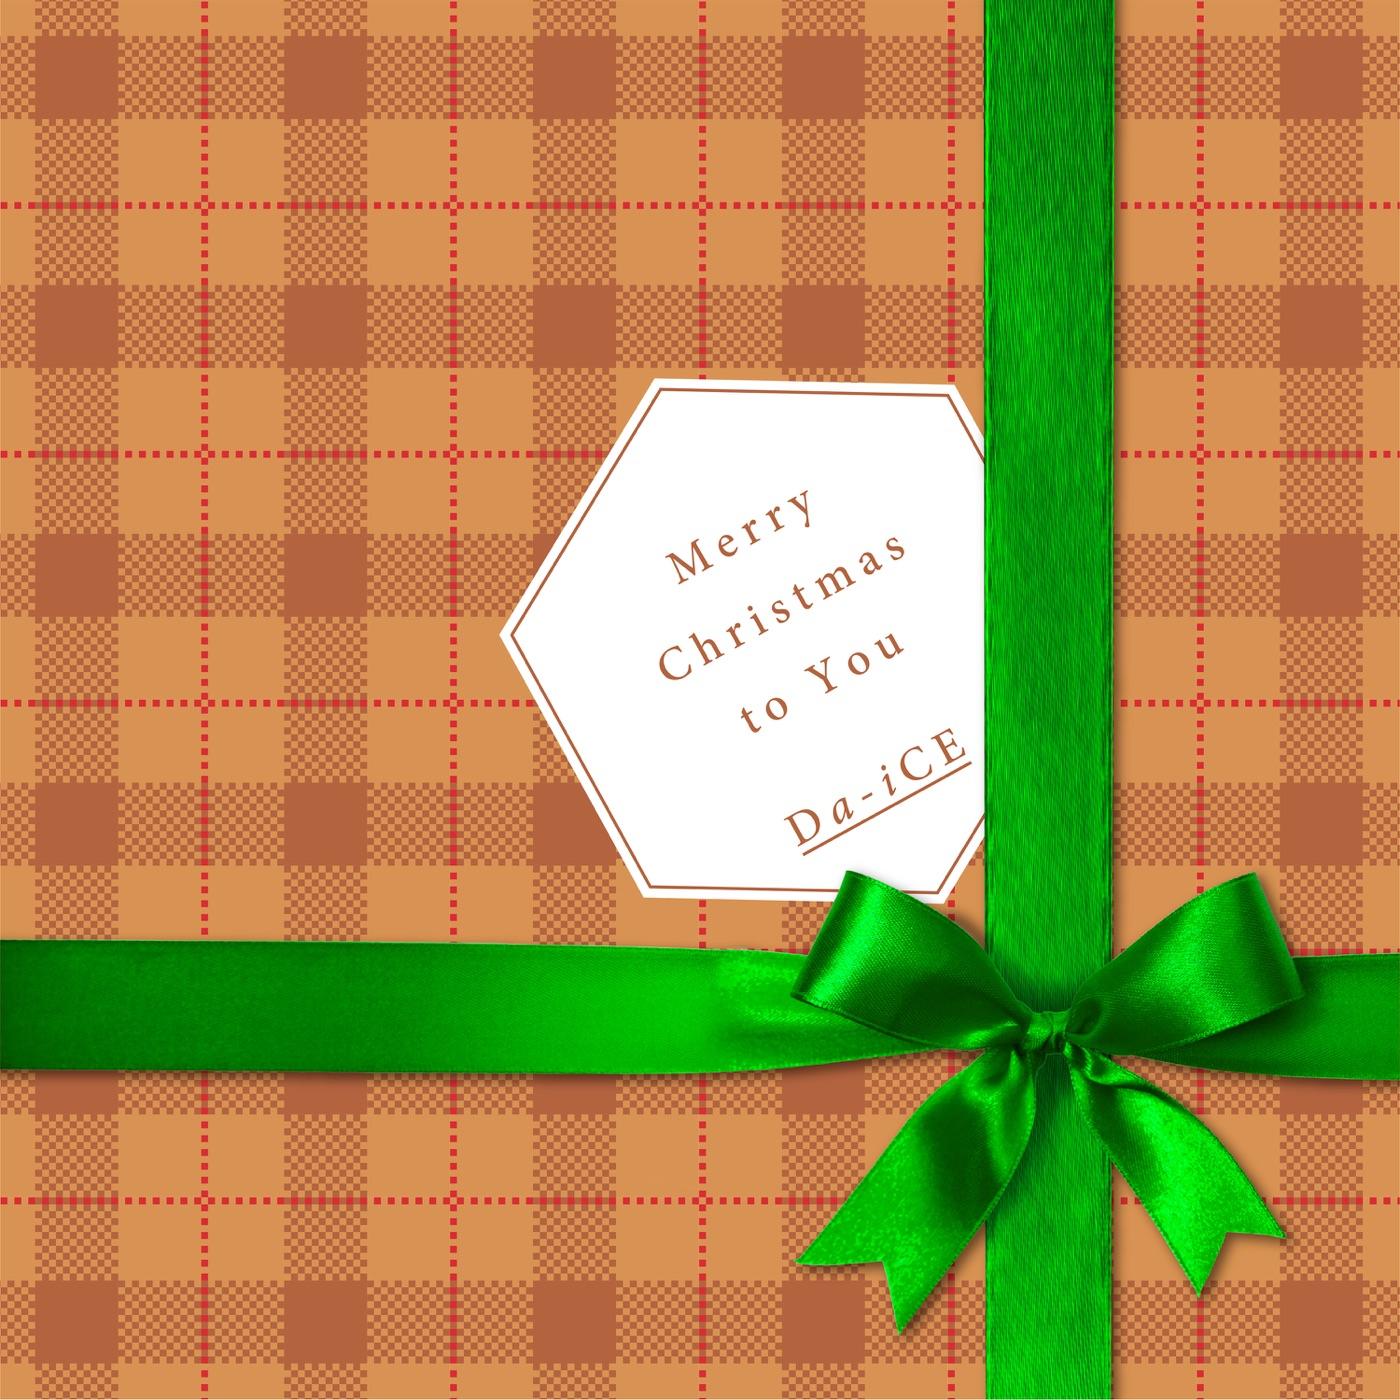 Da-iCE - Merry Christmas To You - Single